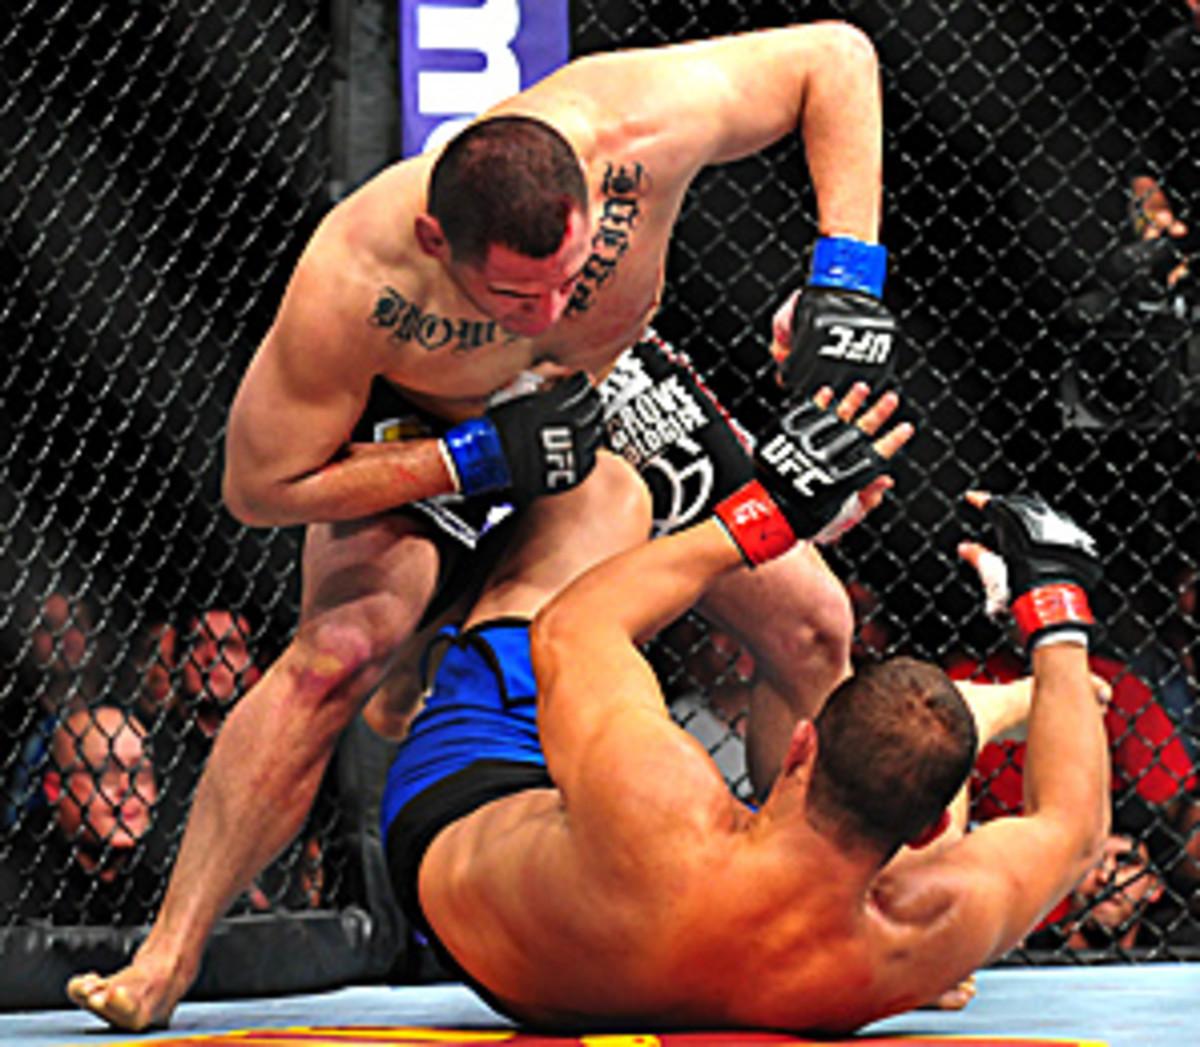 Cain Velasquez (top) defeated Junior Dos Santos unanimously, 50-45, 50-44 and 50-43.